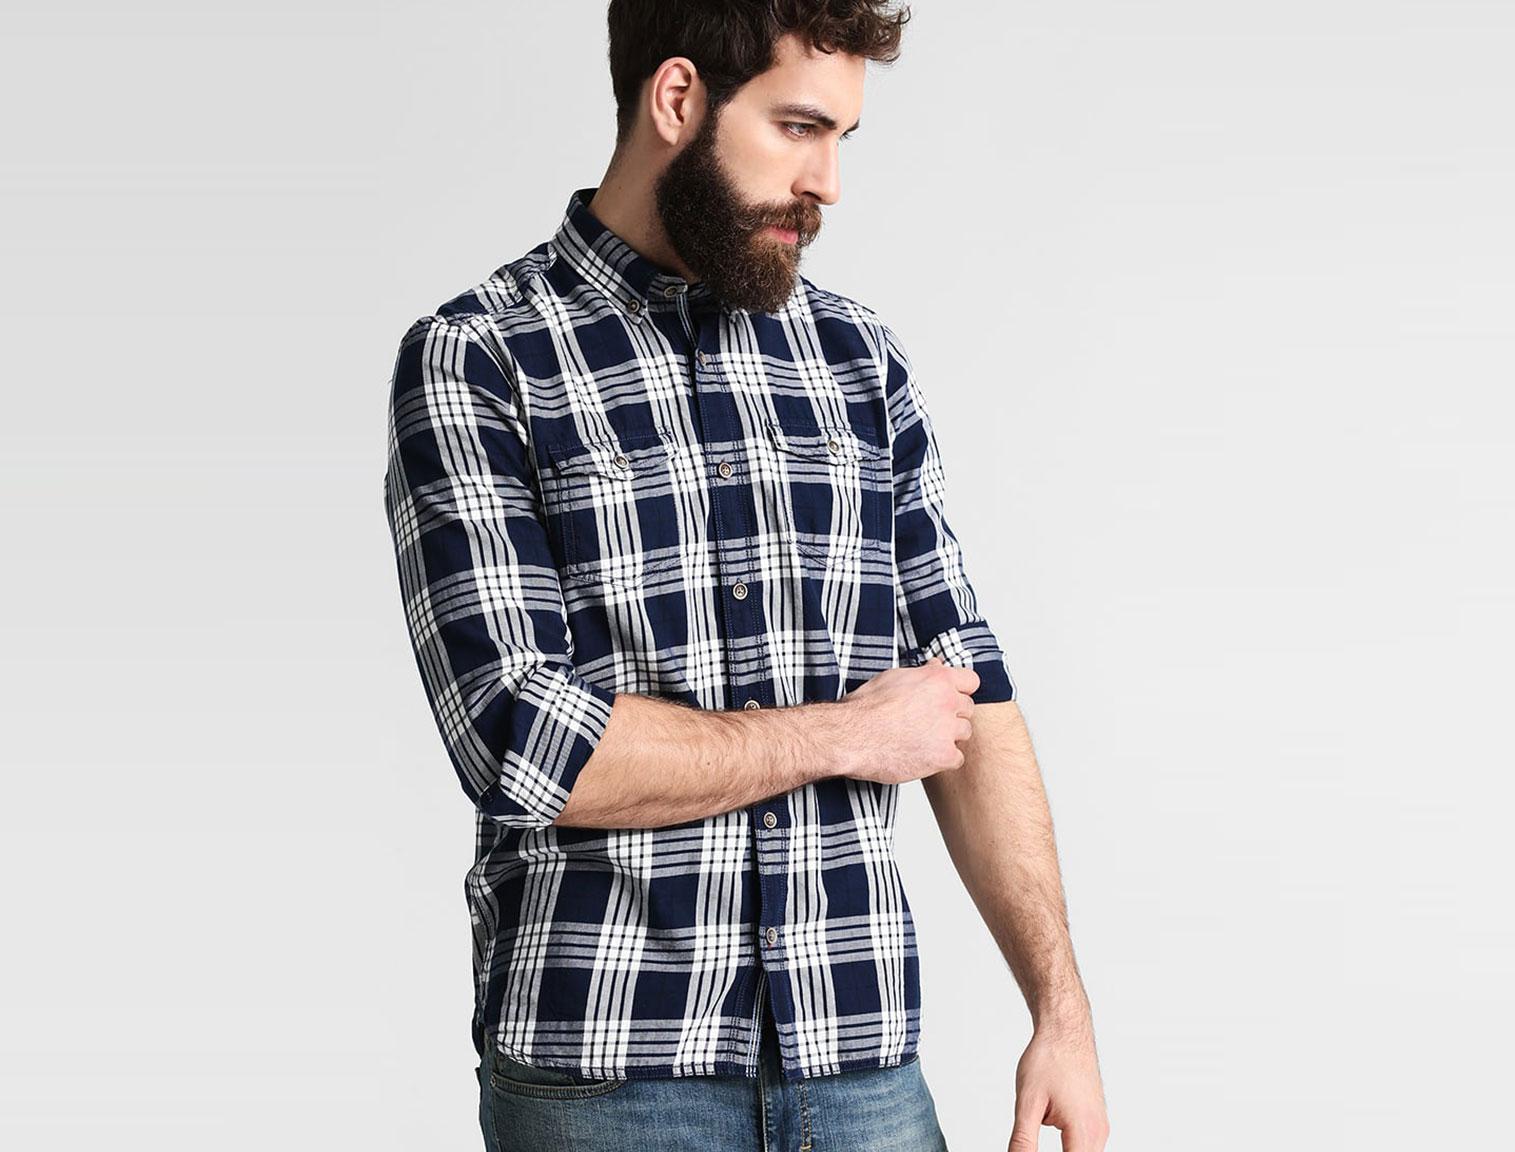 Męska koszula w kratę w Zalando